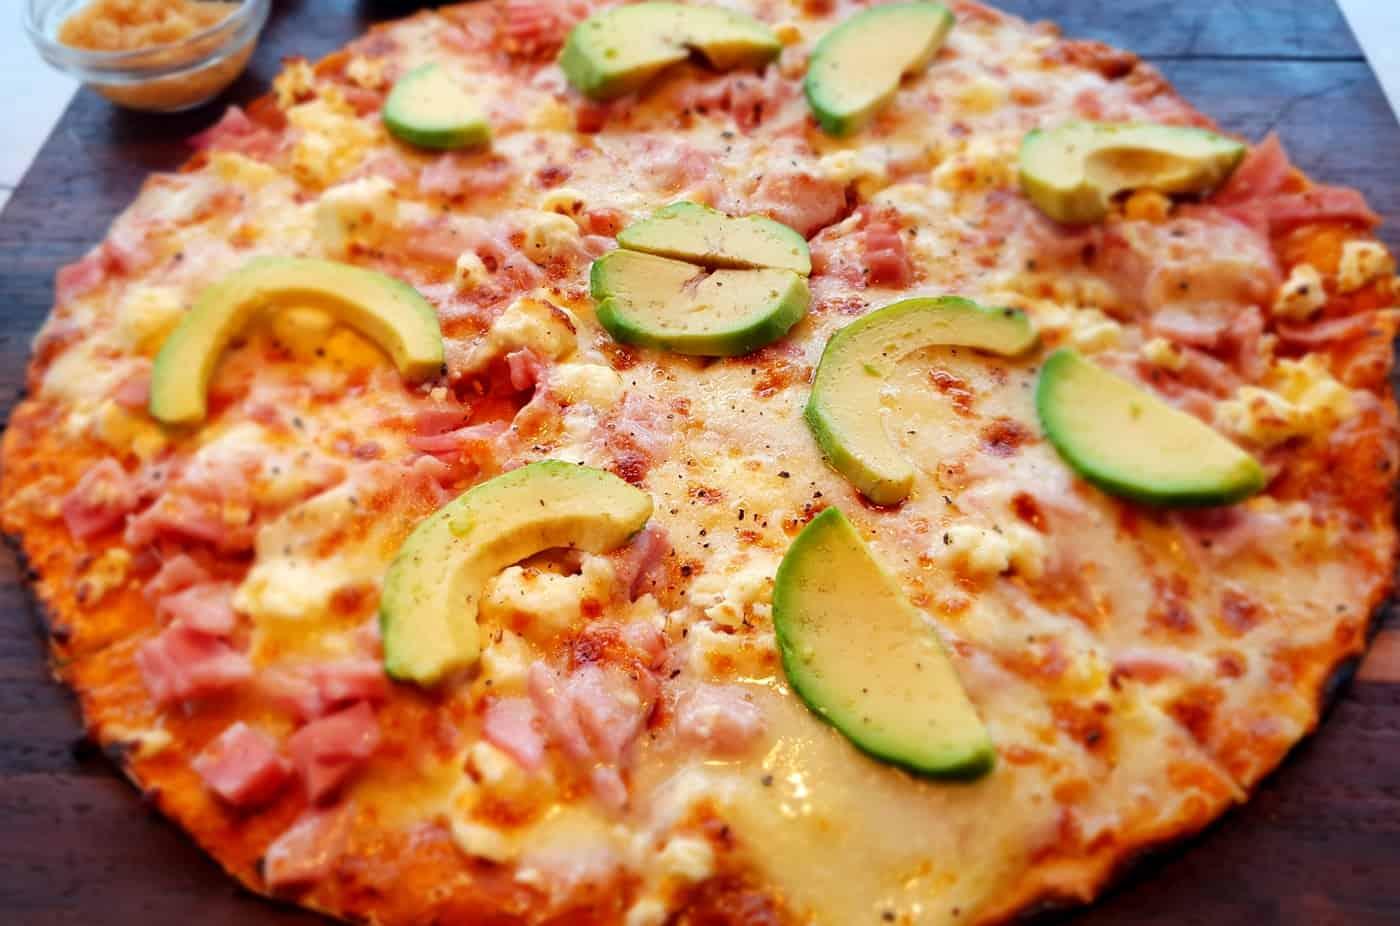 History in the Baking – Arebbusch Pizzeria's All New Medium Sized Pizza